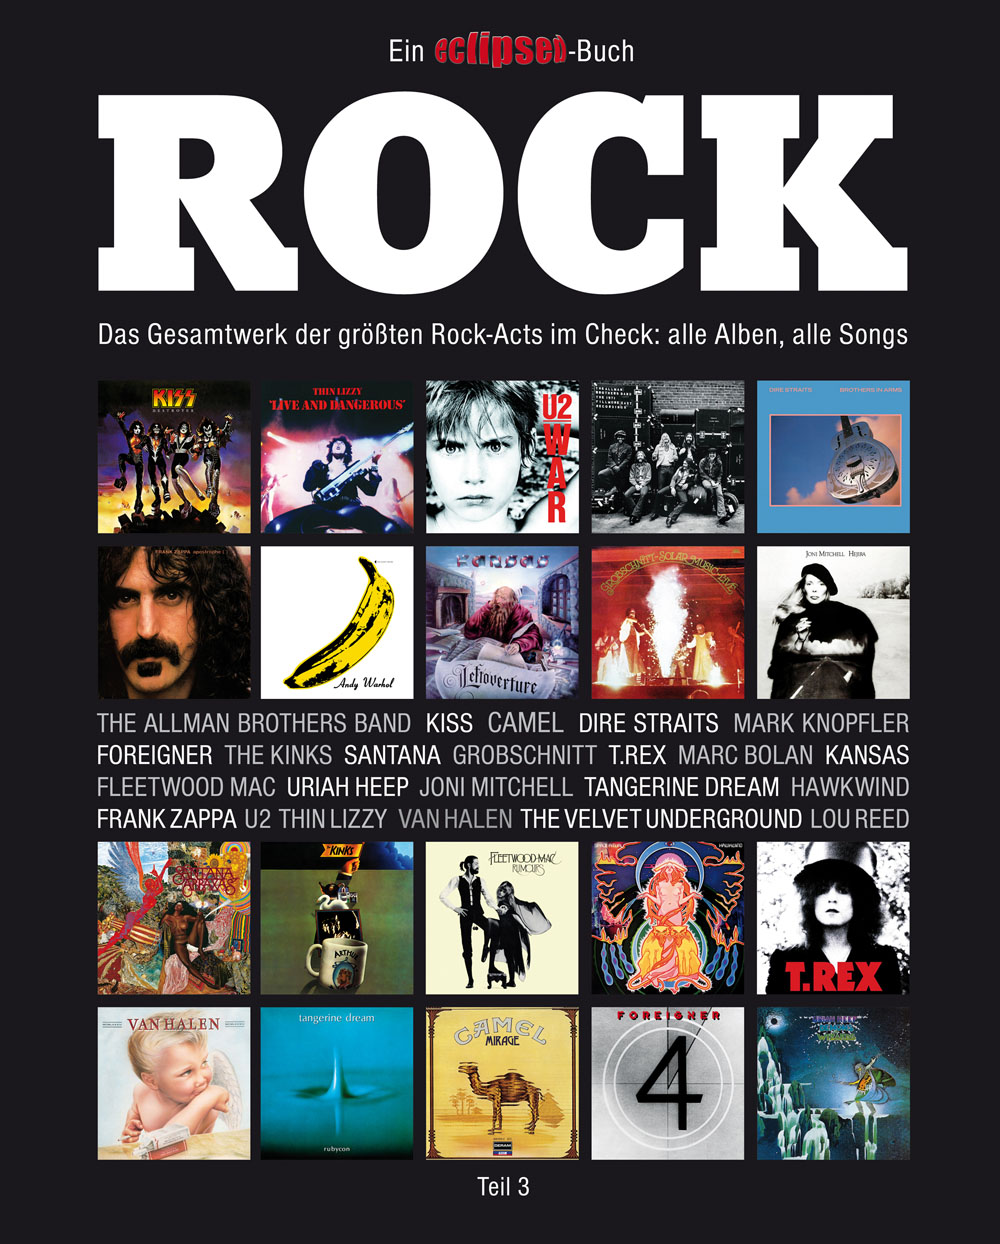 eclipsed-rockbuch-03